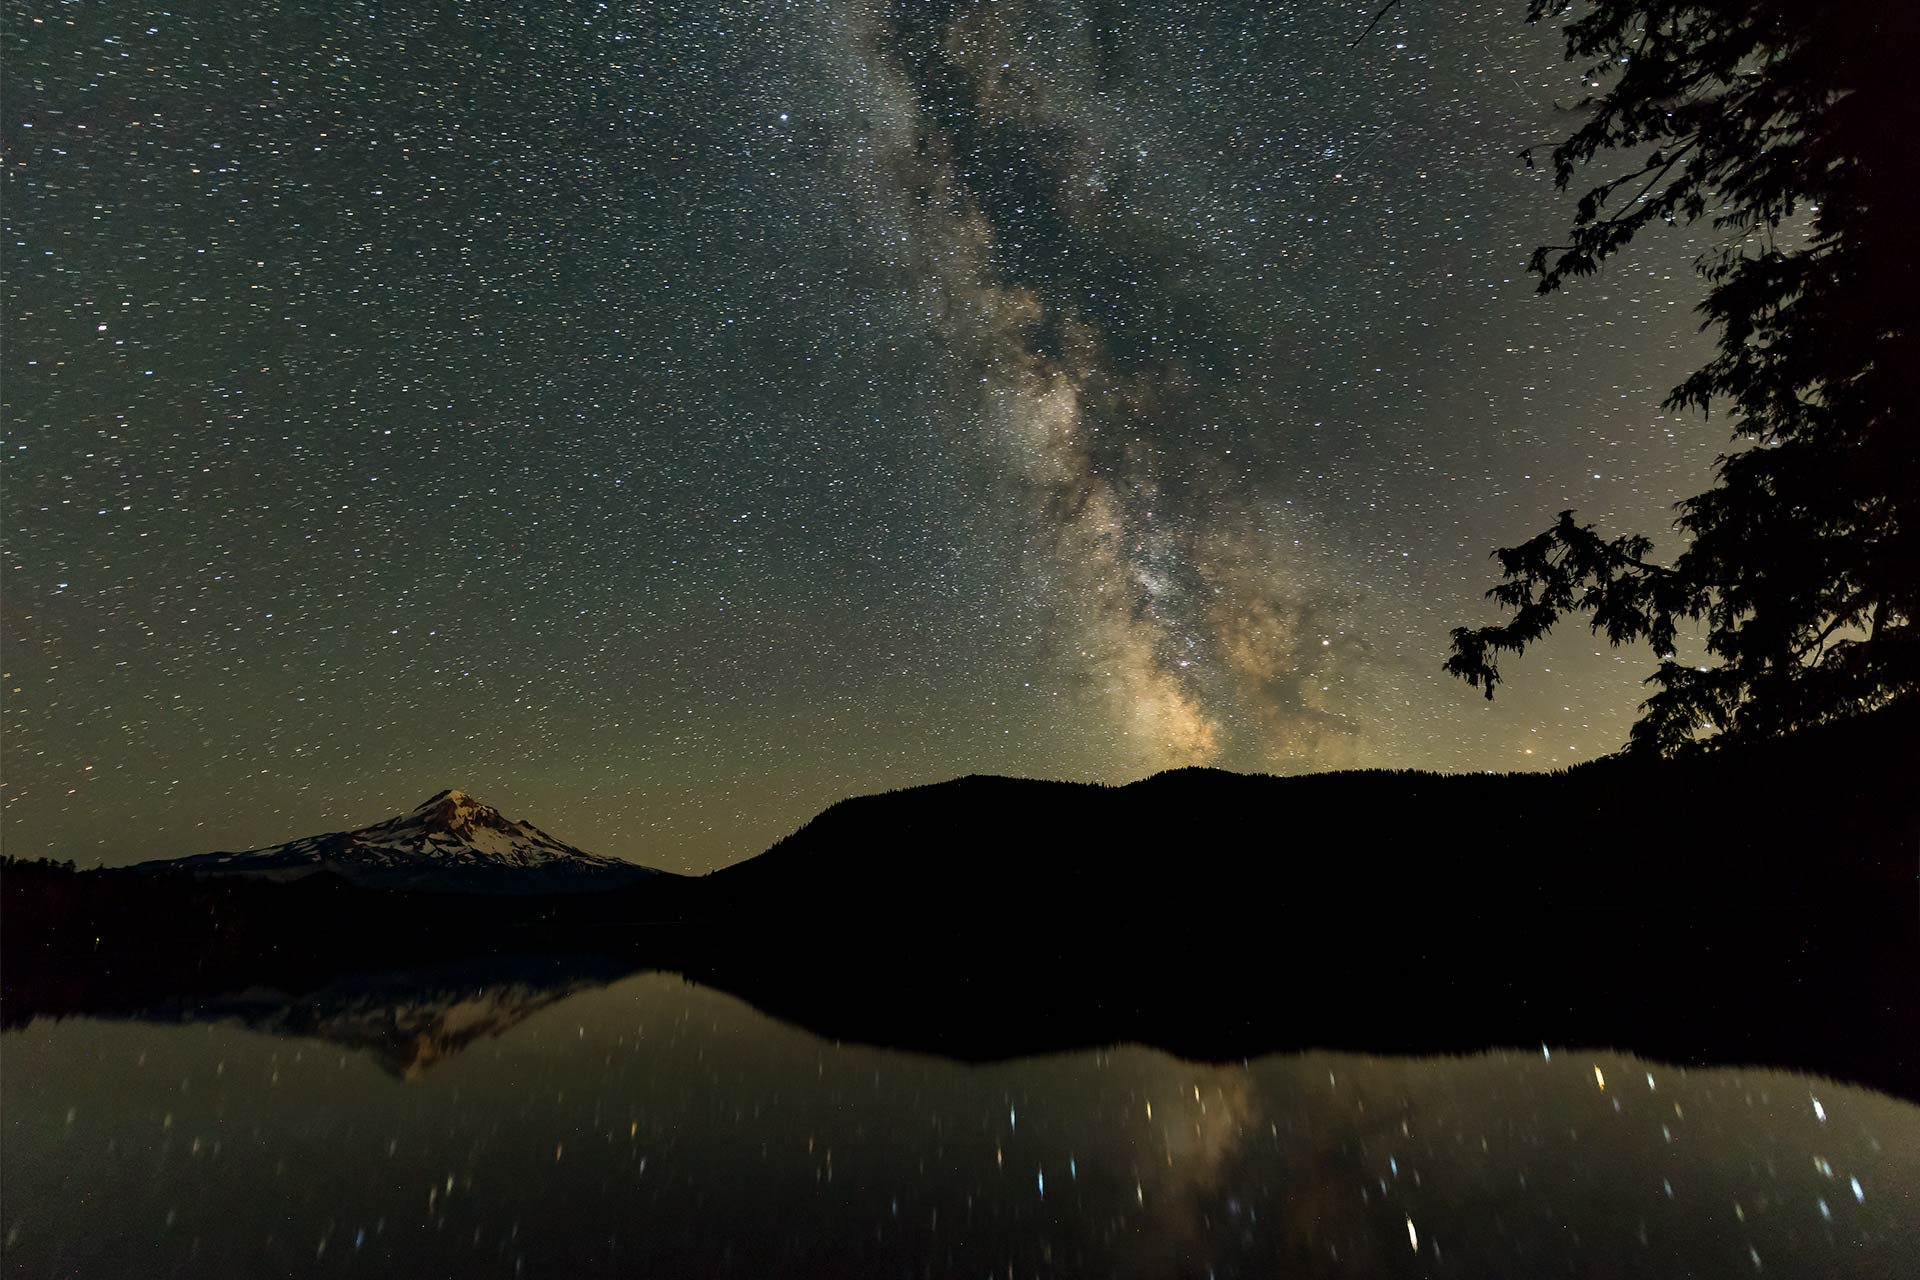 milky-way-night-sky-photography-mt-hood-lost-lake-oregon